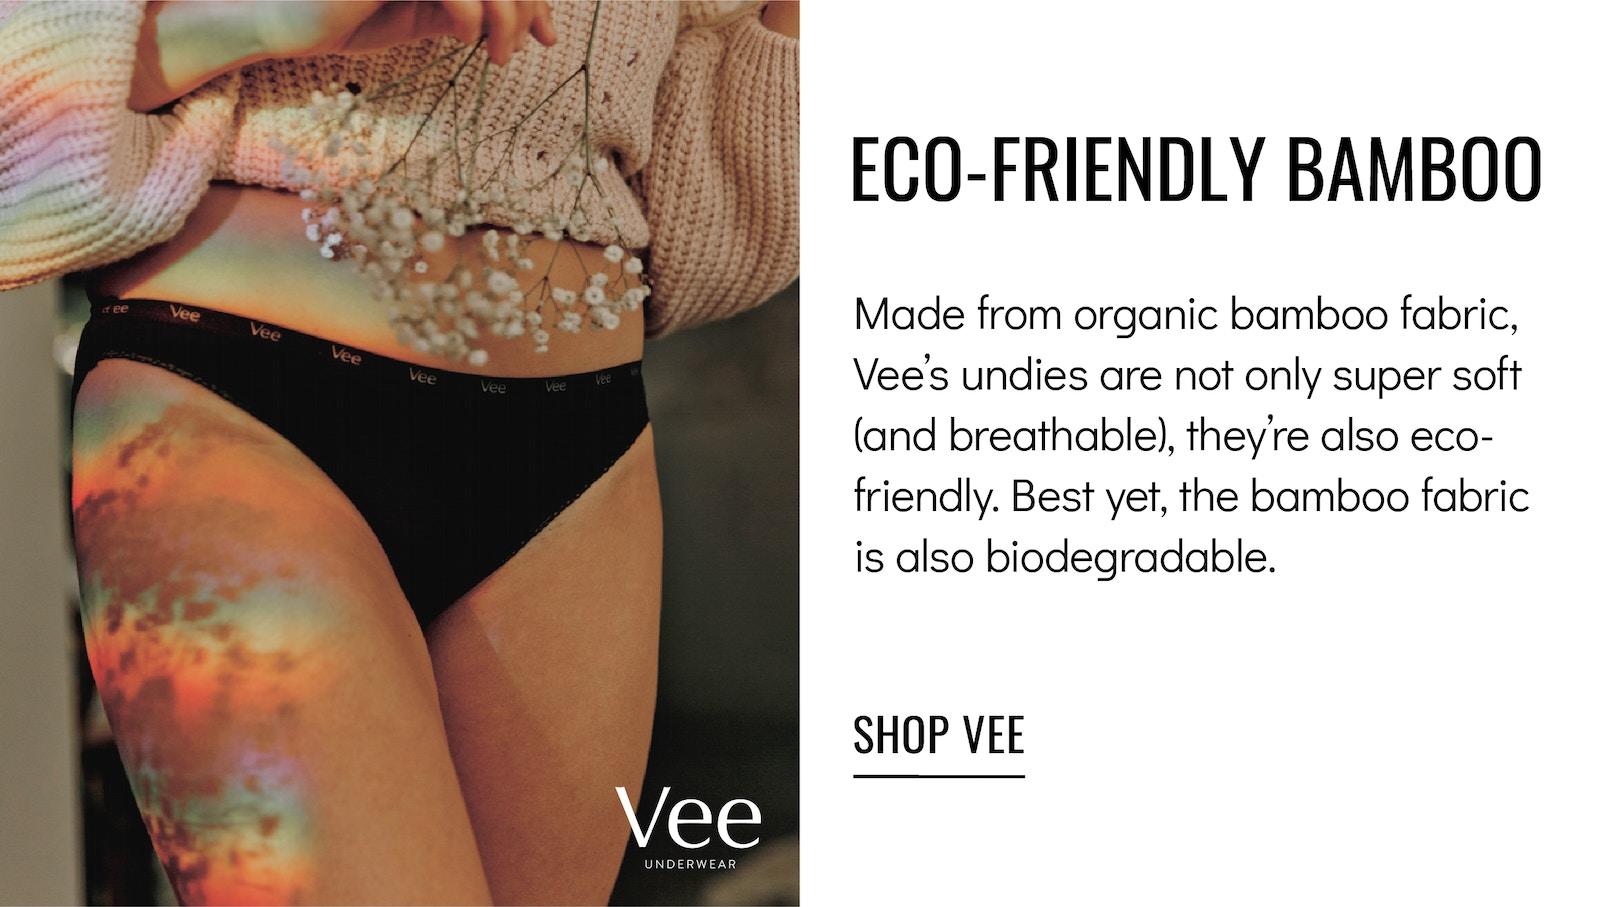 Vee Underwear Eco-friendly Bamboo